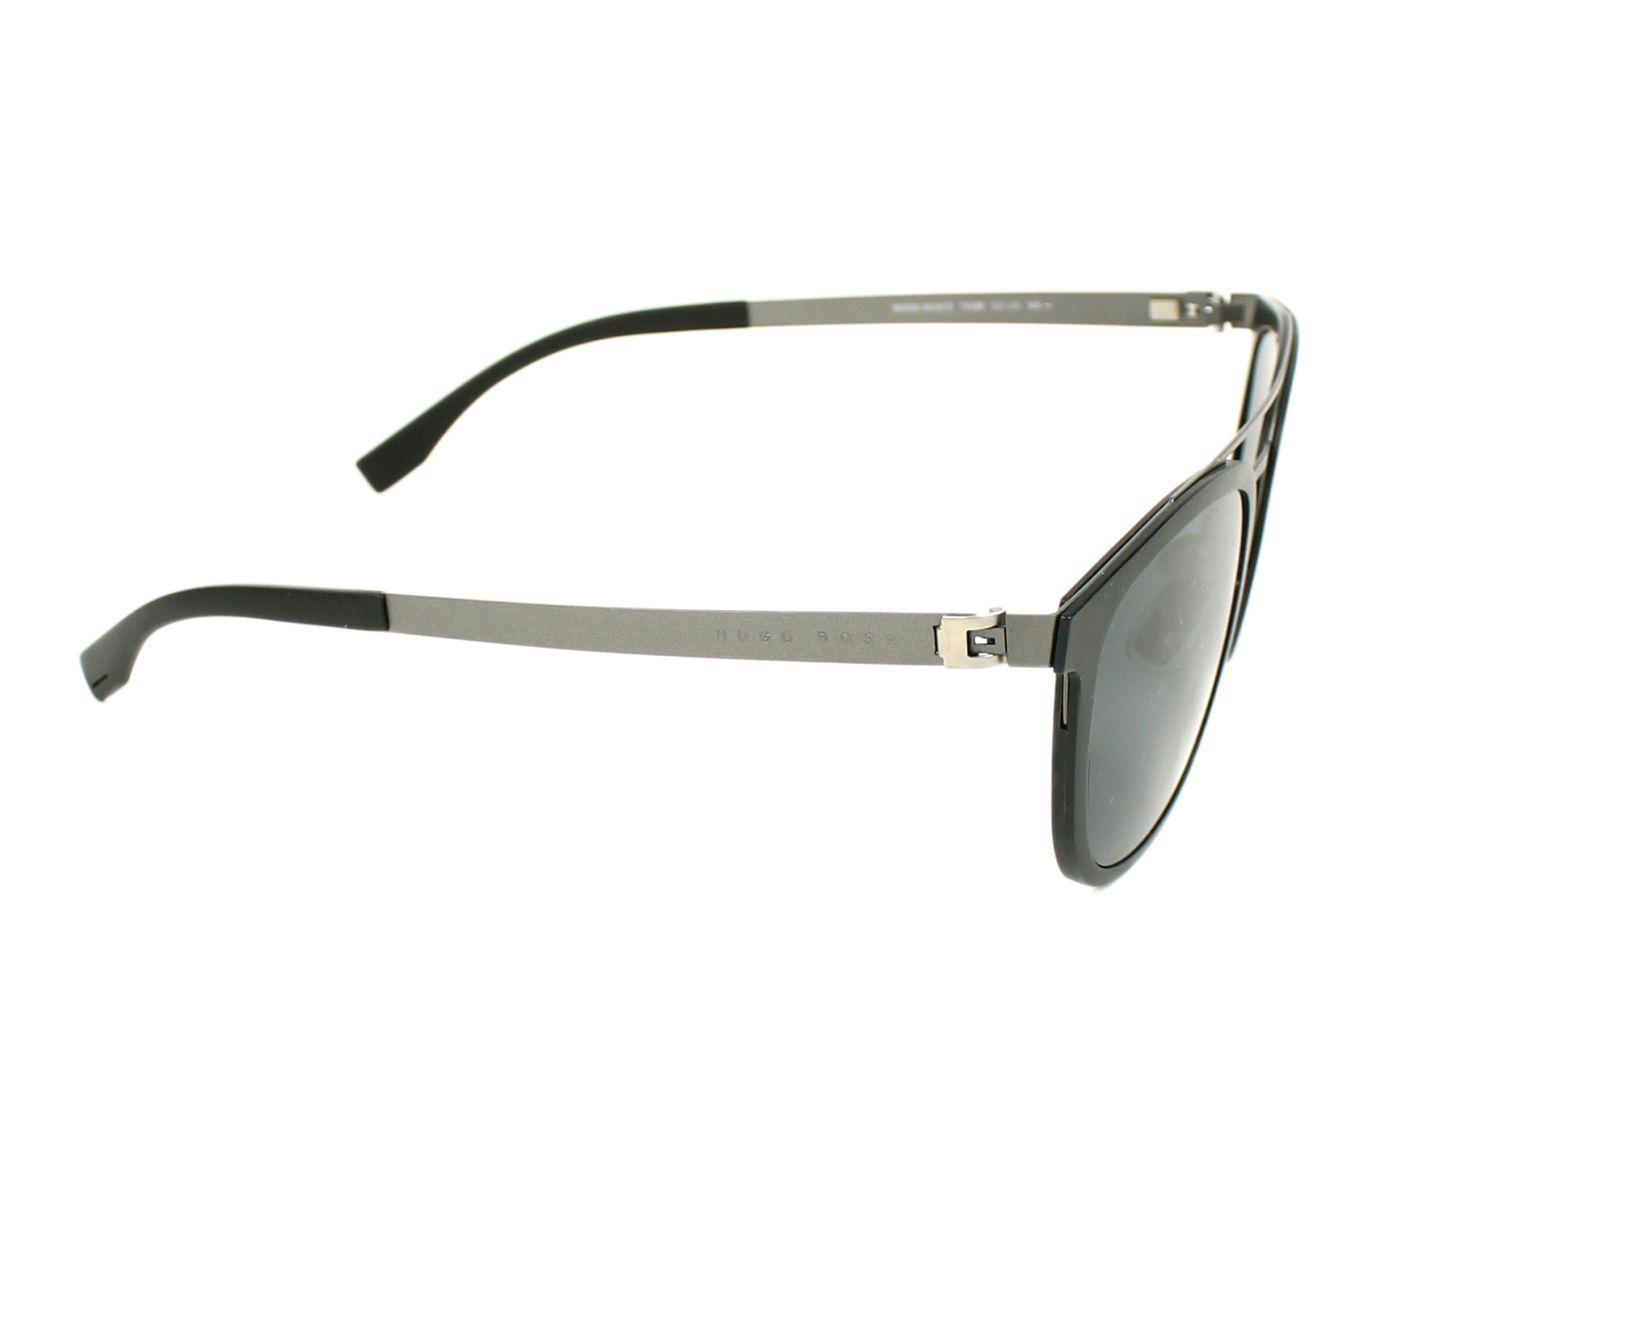 dd07c7f7b62bf Sunglasses Hugo Boss BOSS-0838-S 793 IR 52-21 Black Gun